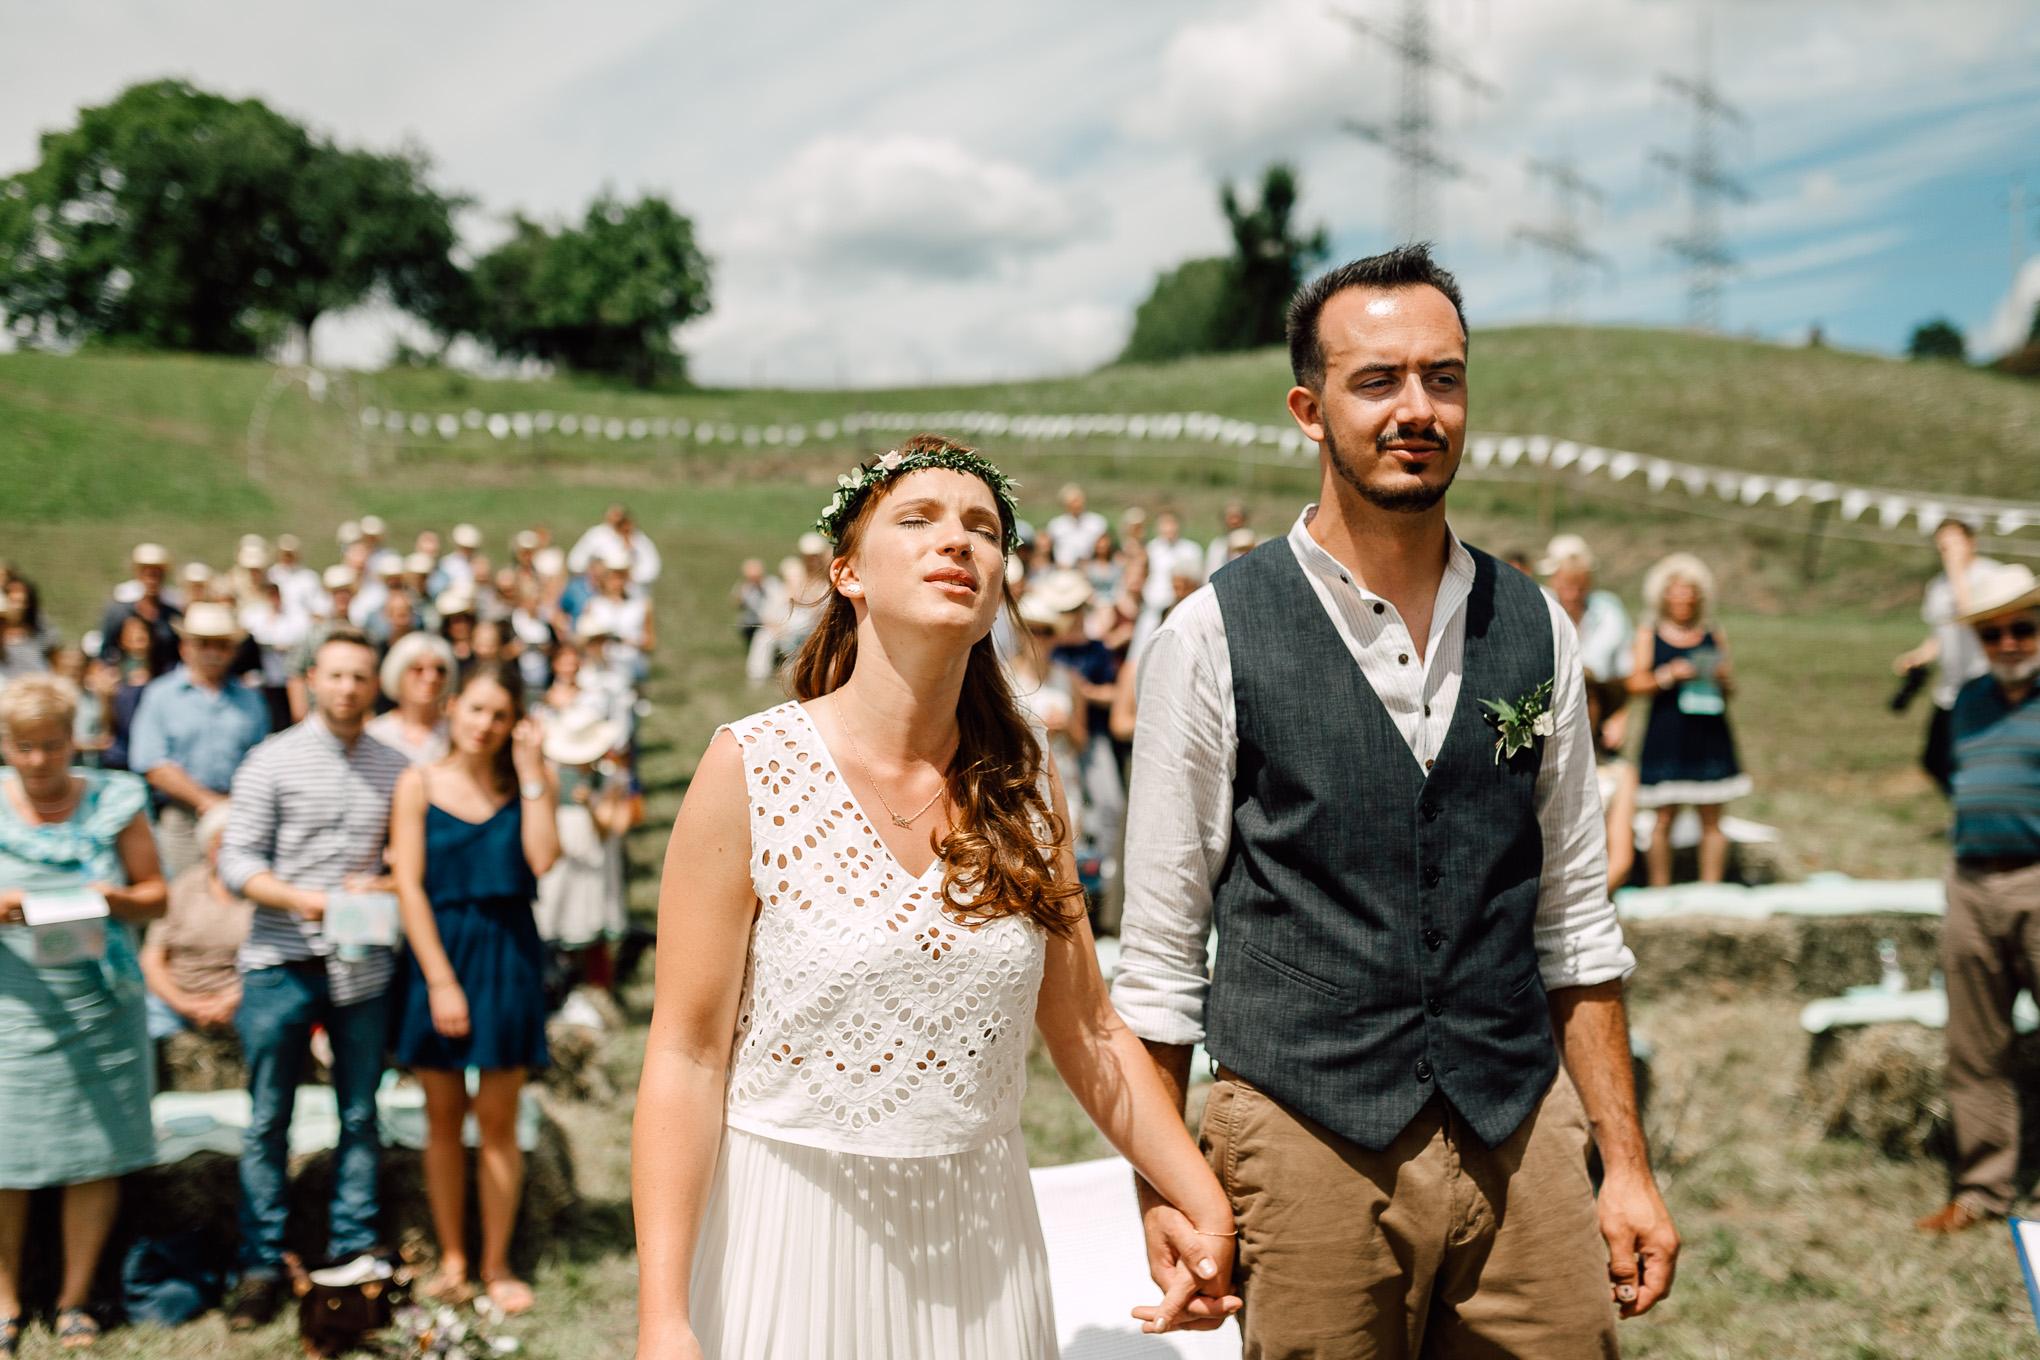 Boho-Scheune-Bauern-Hochzeit-Lörrach-Rheinfelden-Pia-Anna-Christian-Photography-NC-29.jpg